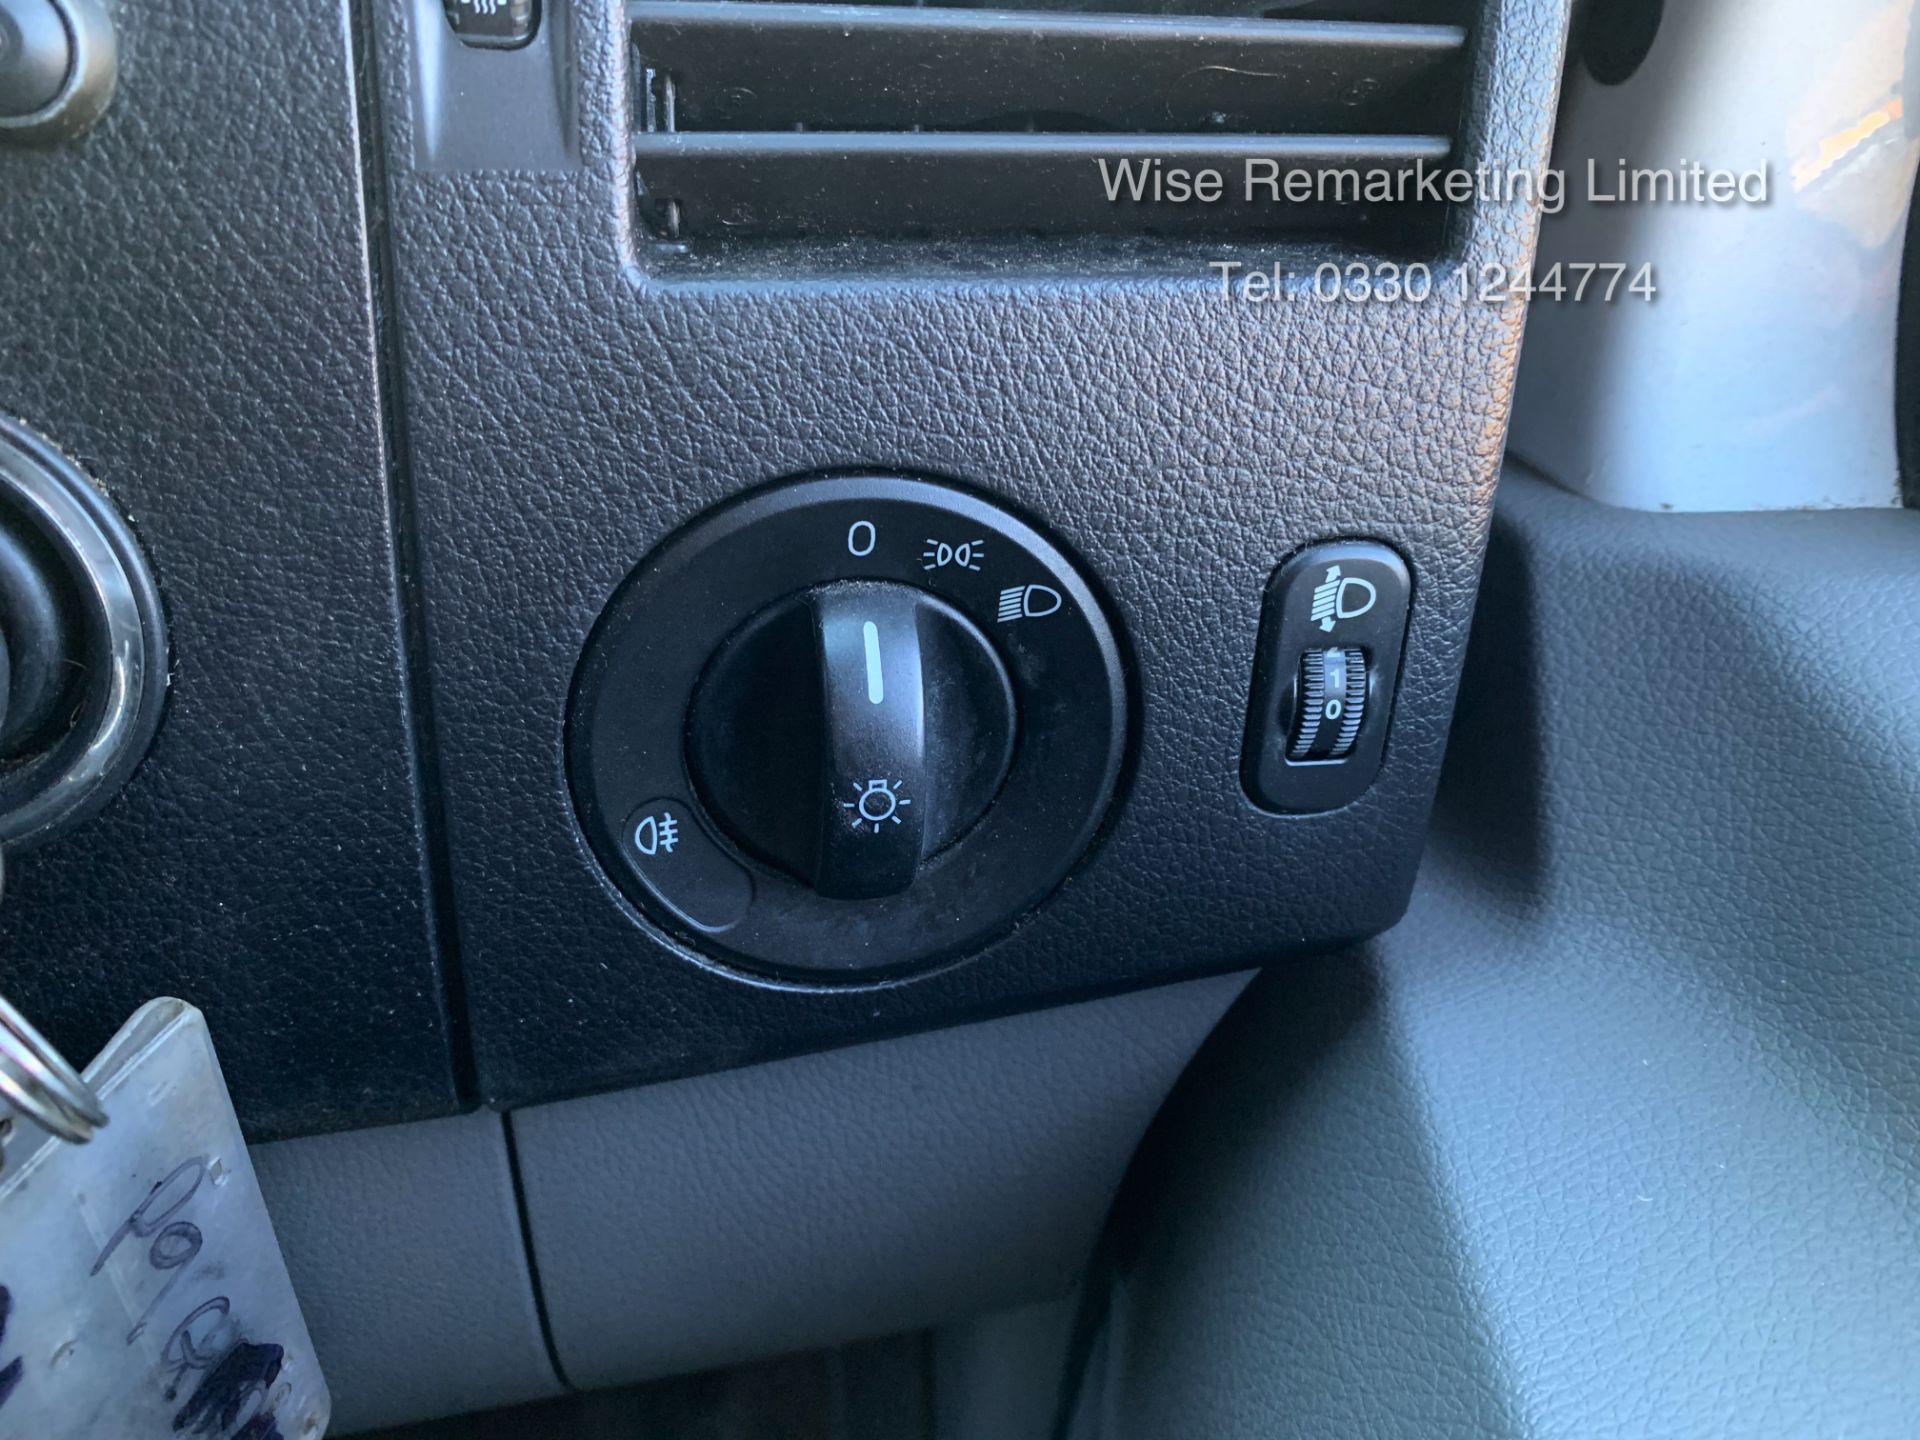 Lot 9 - Mercedes Sprinter 316 2.1 CDI Long Wheel Base Fridge/Freezer Overnight Standby Van - 2014 Model